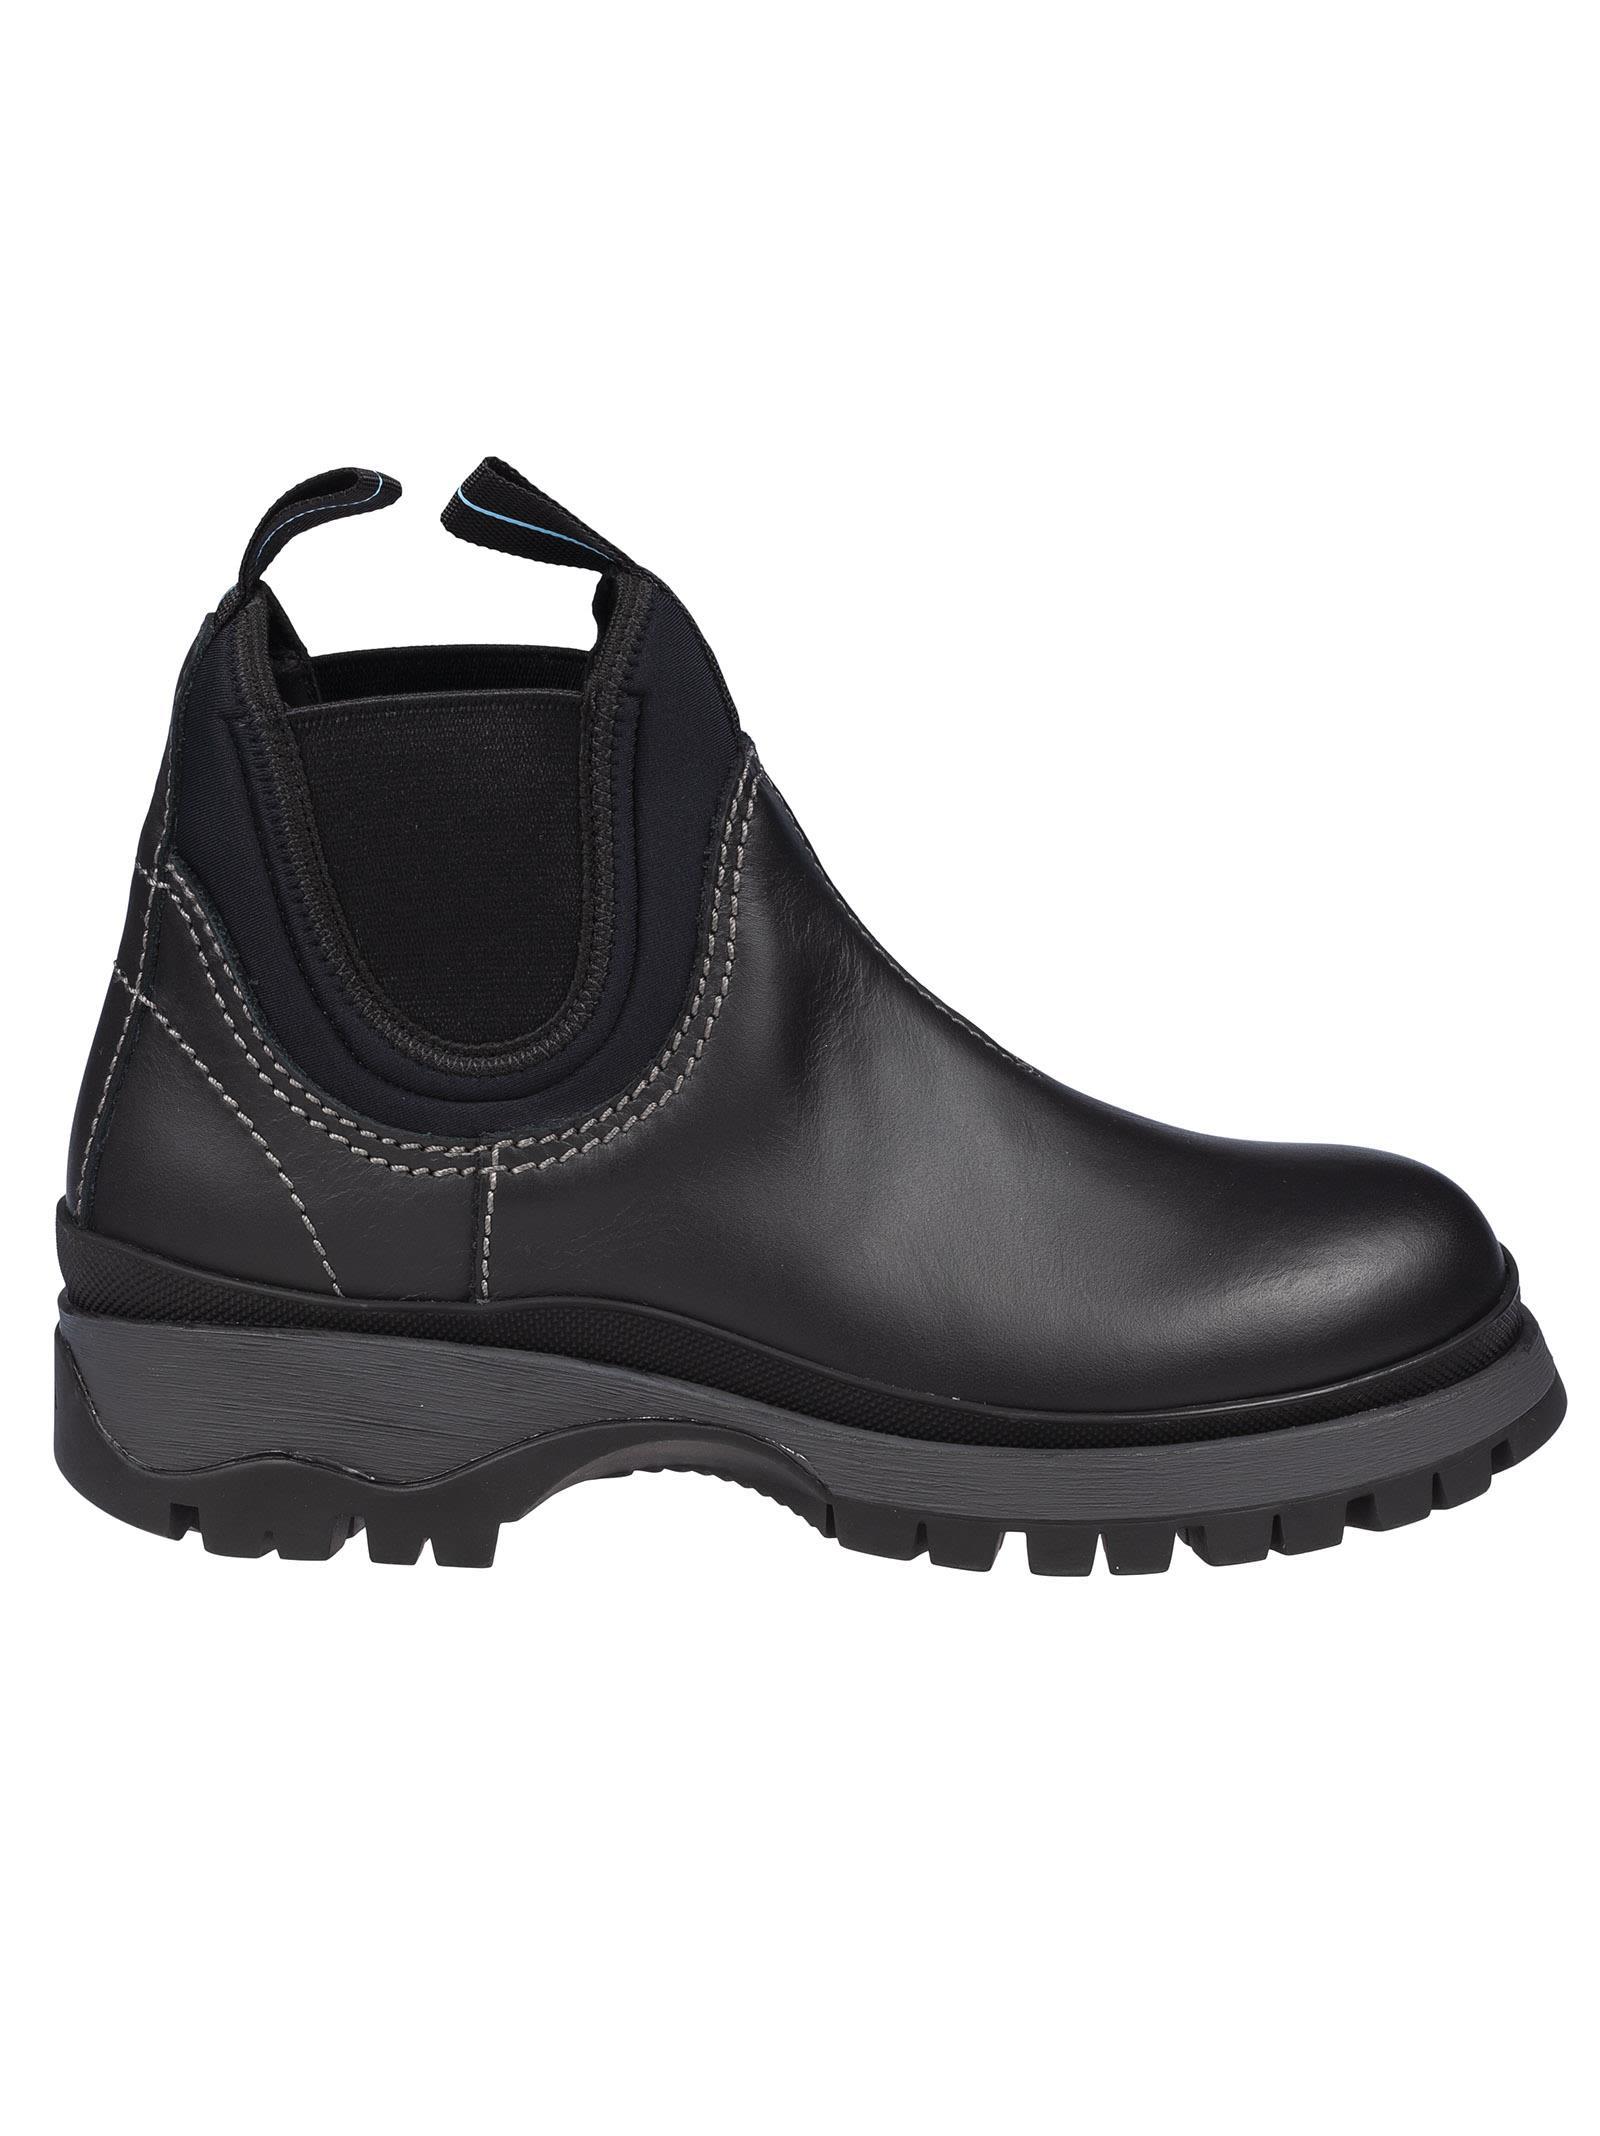 PRADA | Prada Chunky Chelsea Boots | Clouty